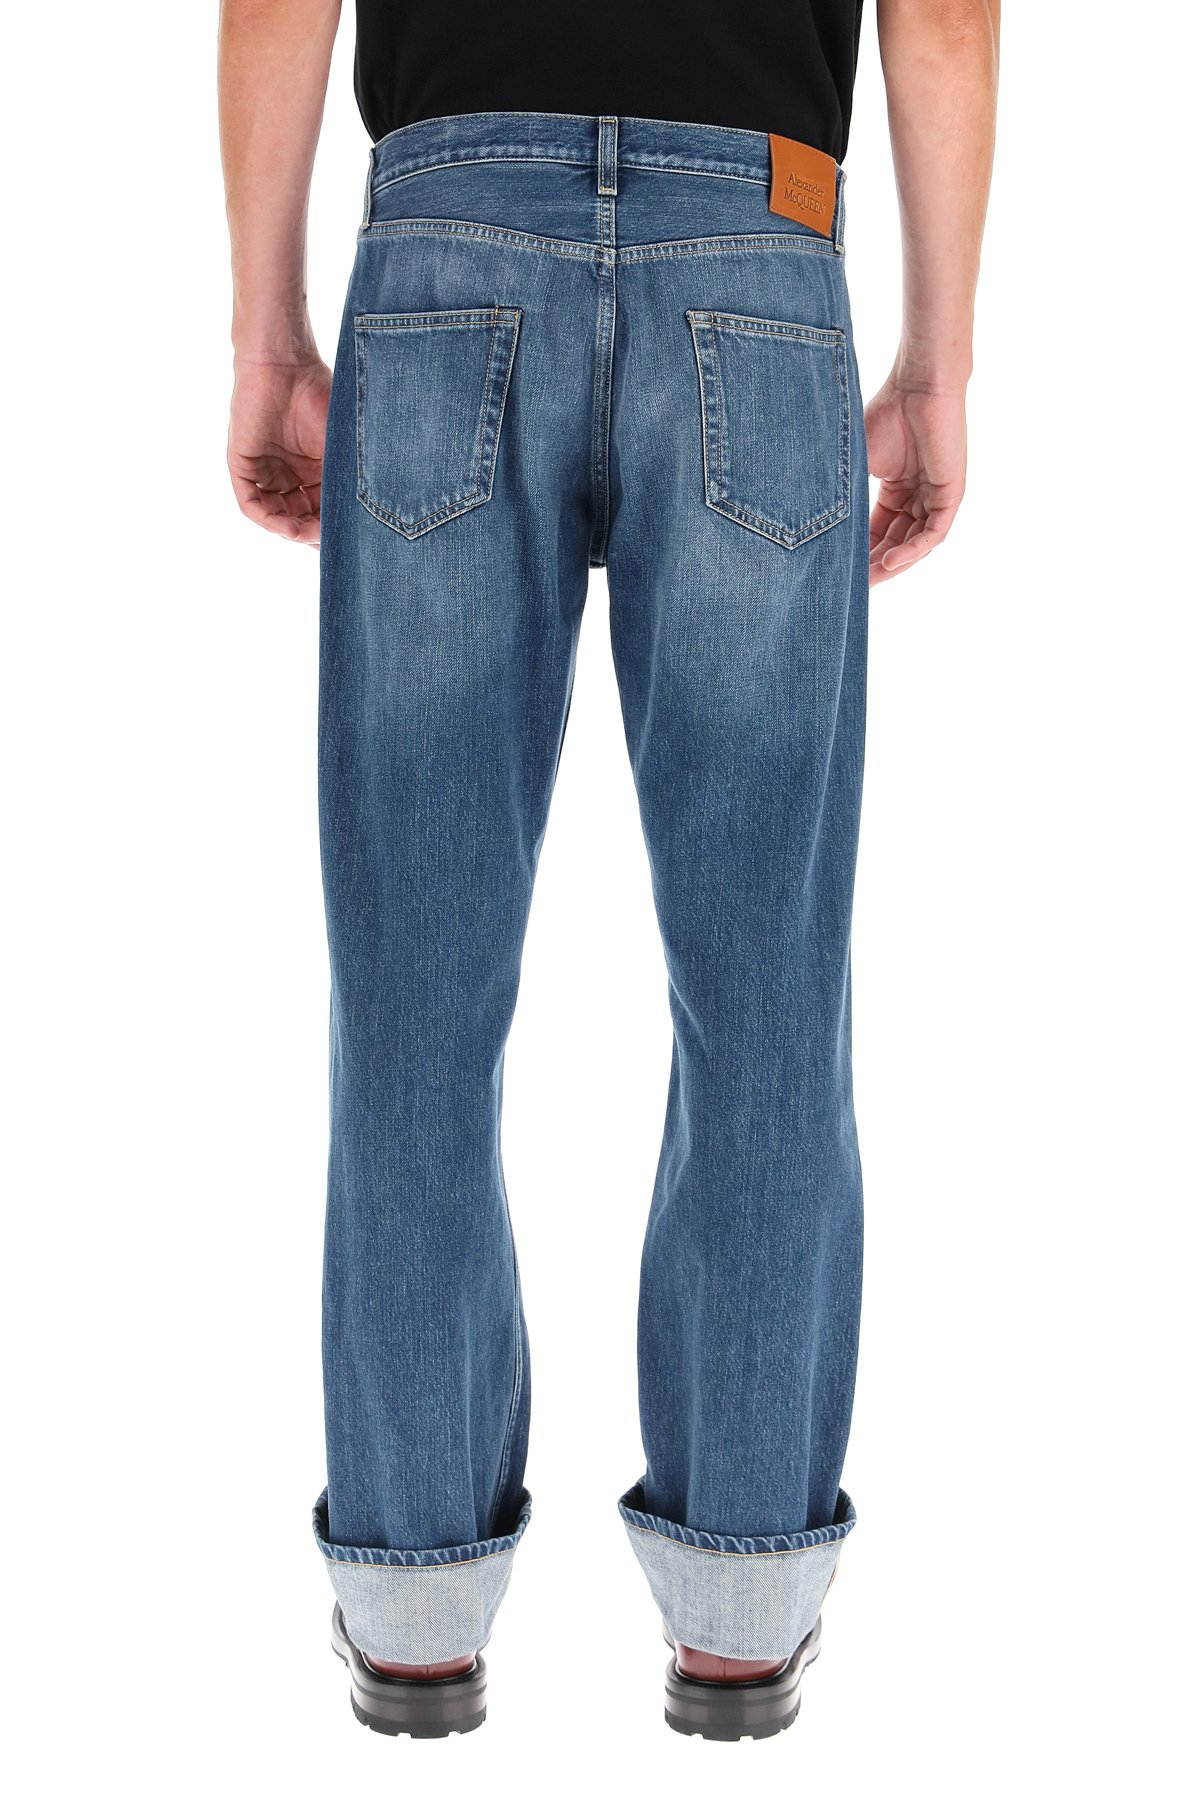 Alexander mcqueen jeans con cimosa decorativa